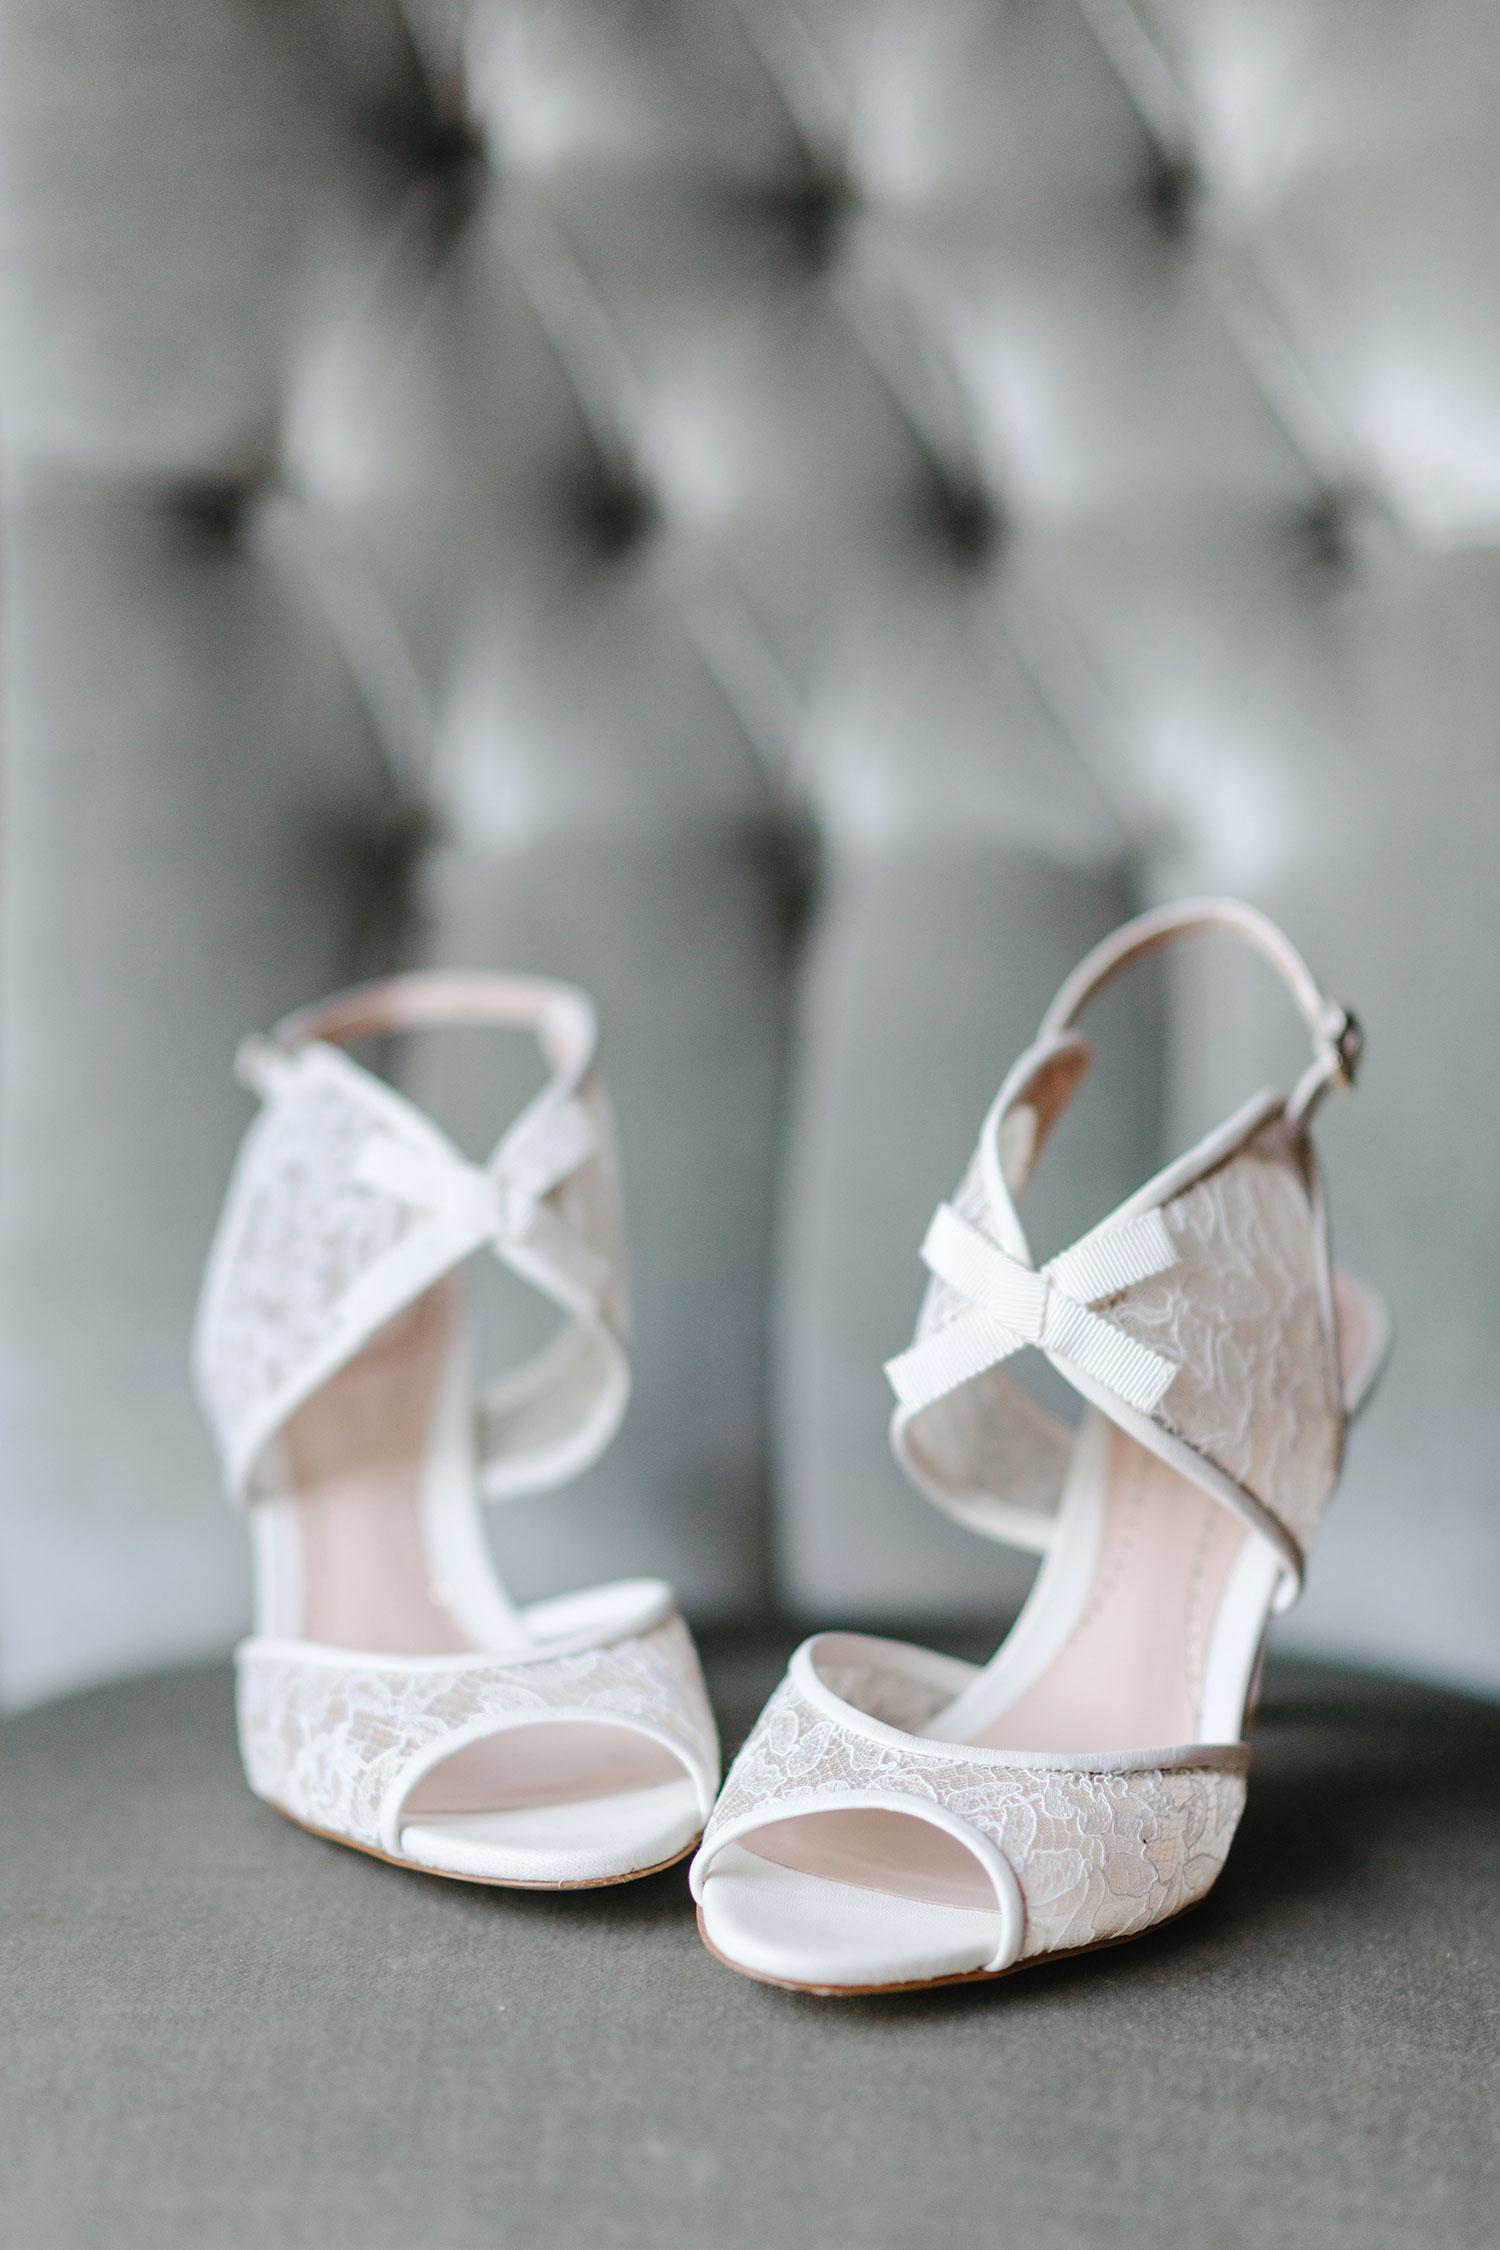 castlemartyr-wedding-photography-0005_0376.jpg